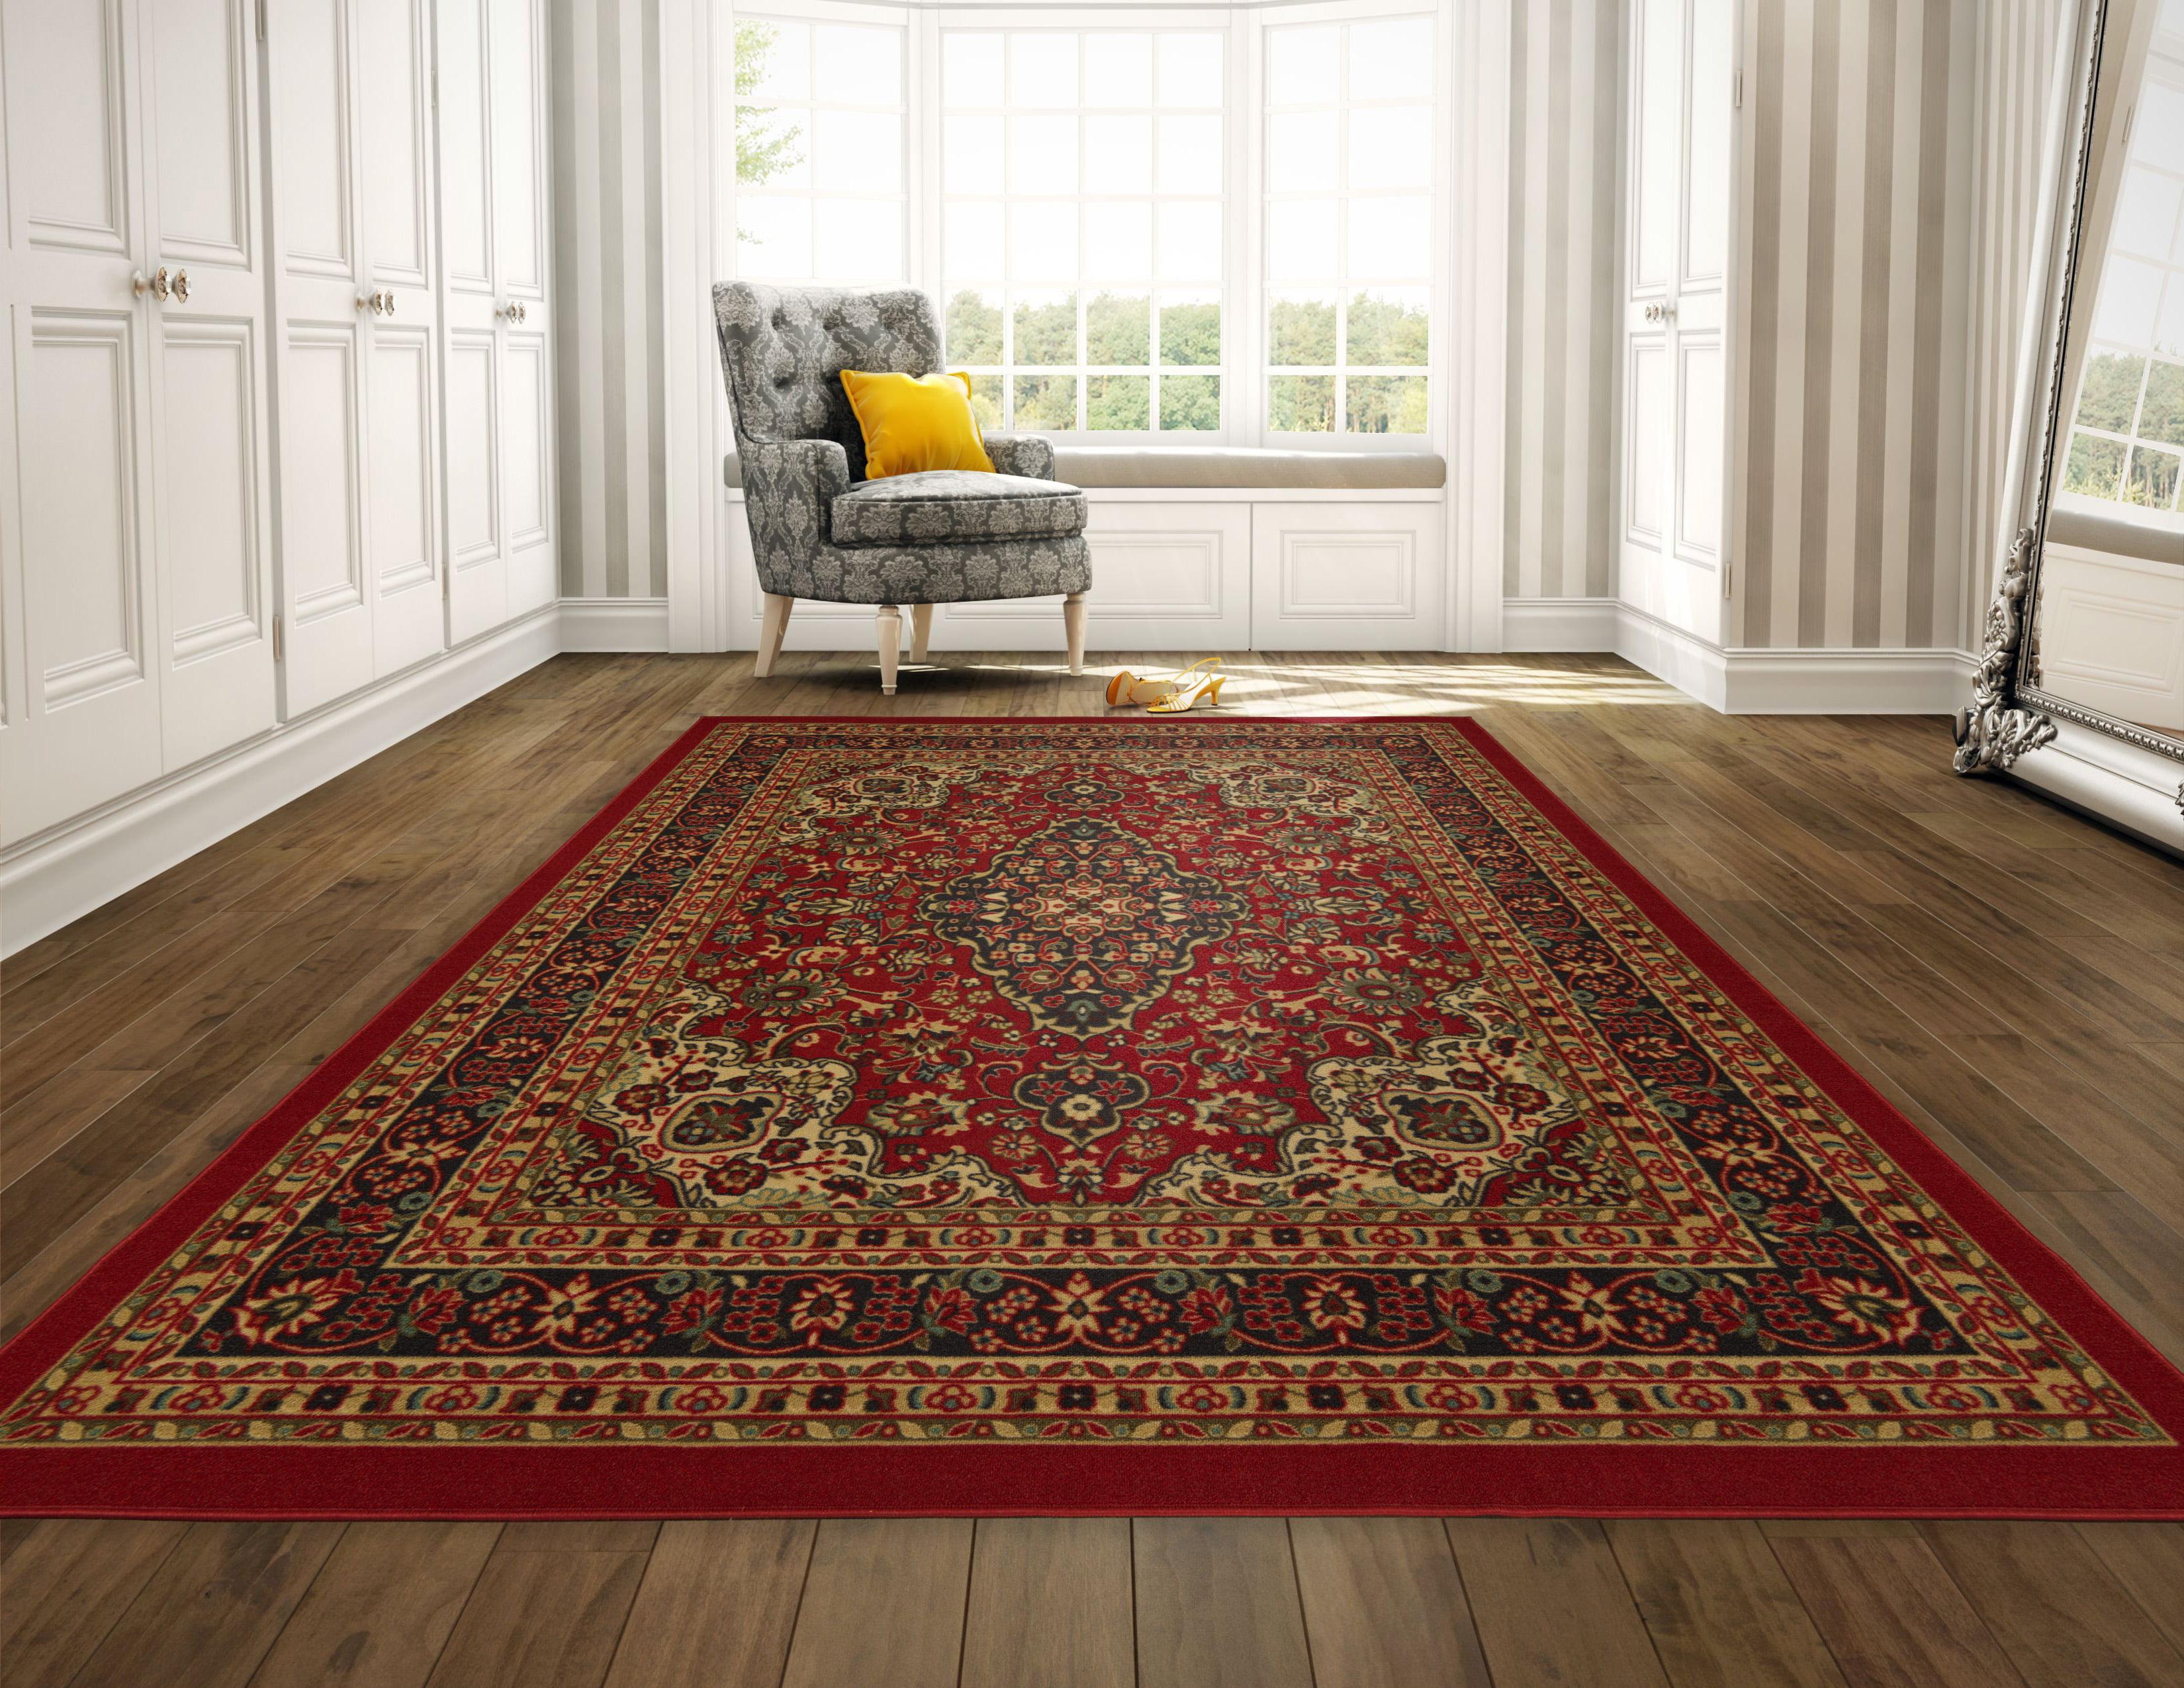 Ottomanson Ottohome Collection Persian Heriz Oriental Design Red or Seafoam Area and... by Ottomanson